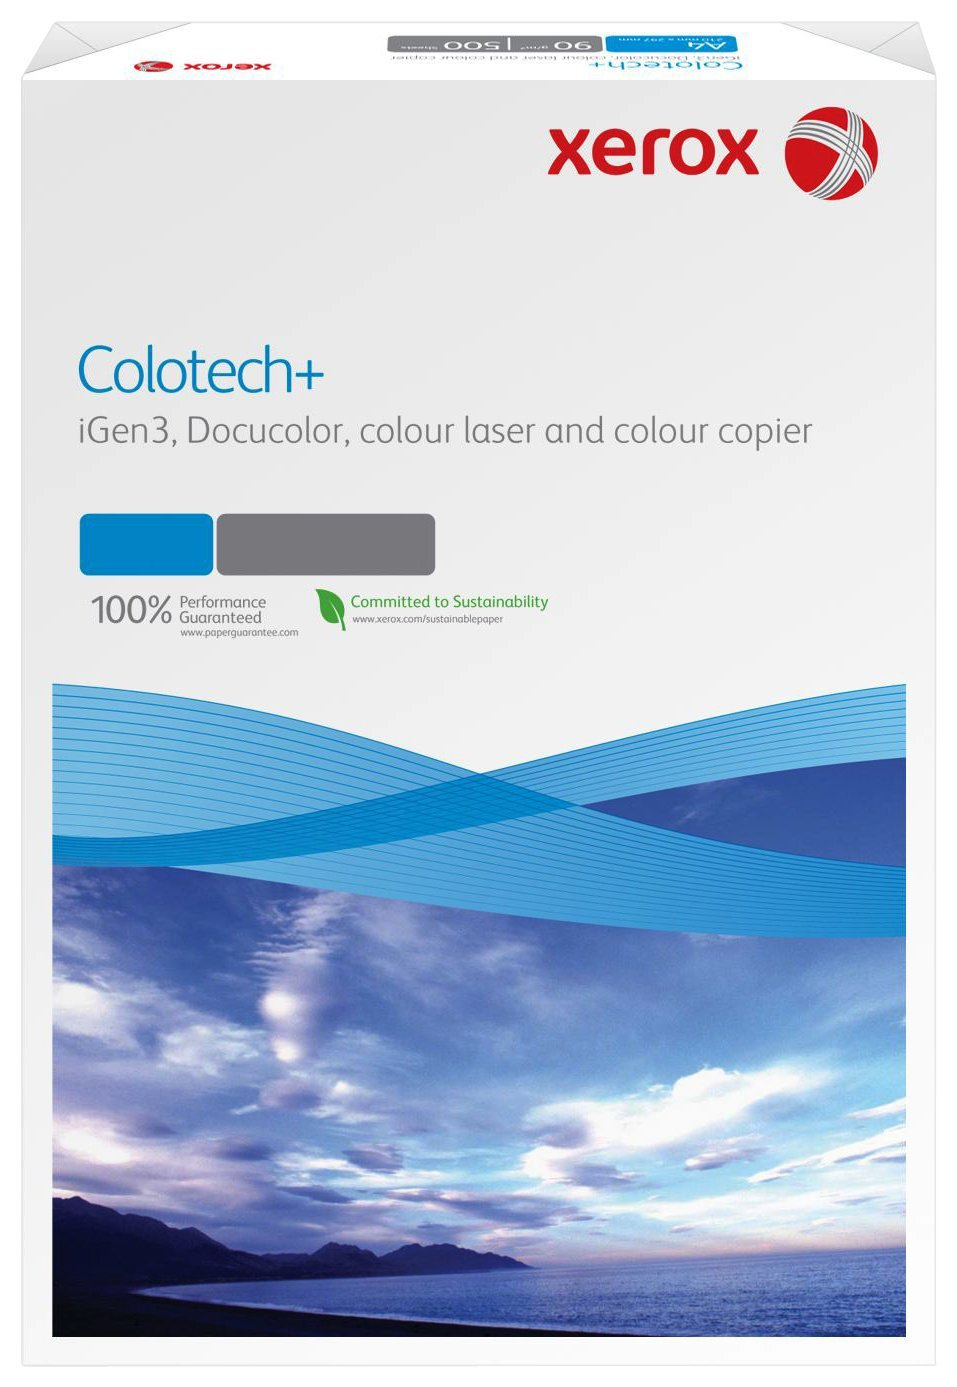 Xerox Colour Tech 003R95838 Premium Colour Laser Printer Paper / Printer Paper / Colour Photocopier Paper / SRA3 90 g/m? Pack of 500 Sheets White